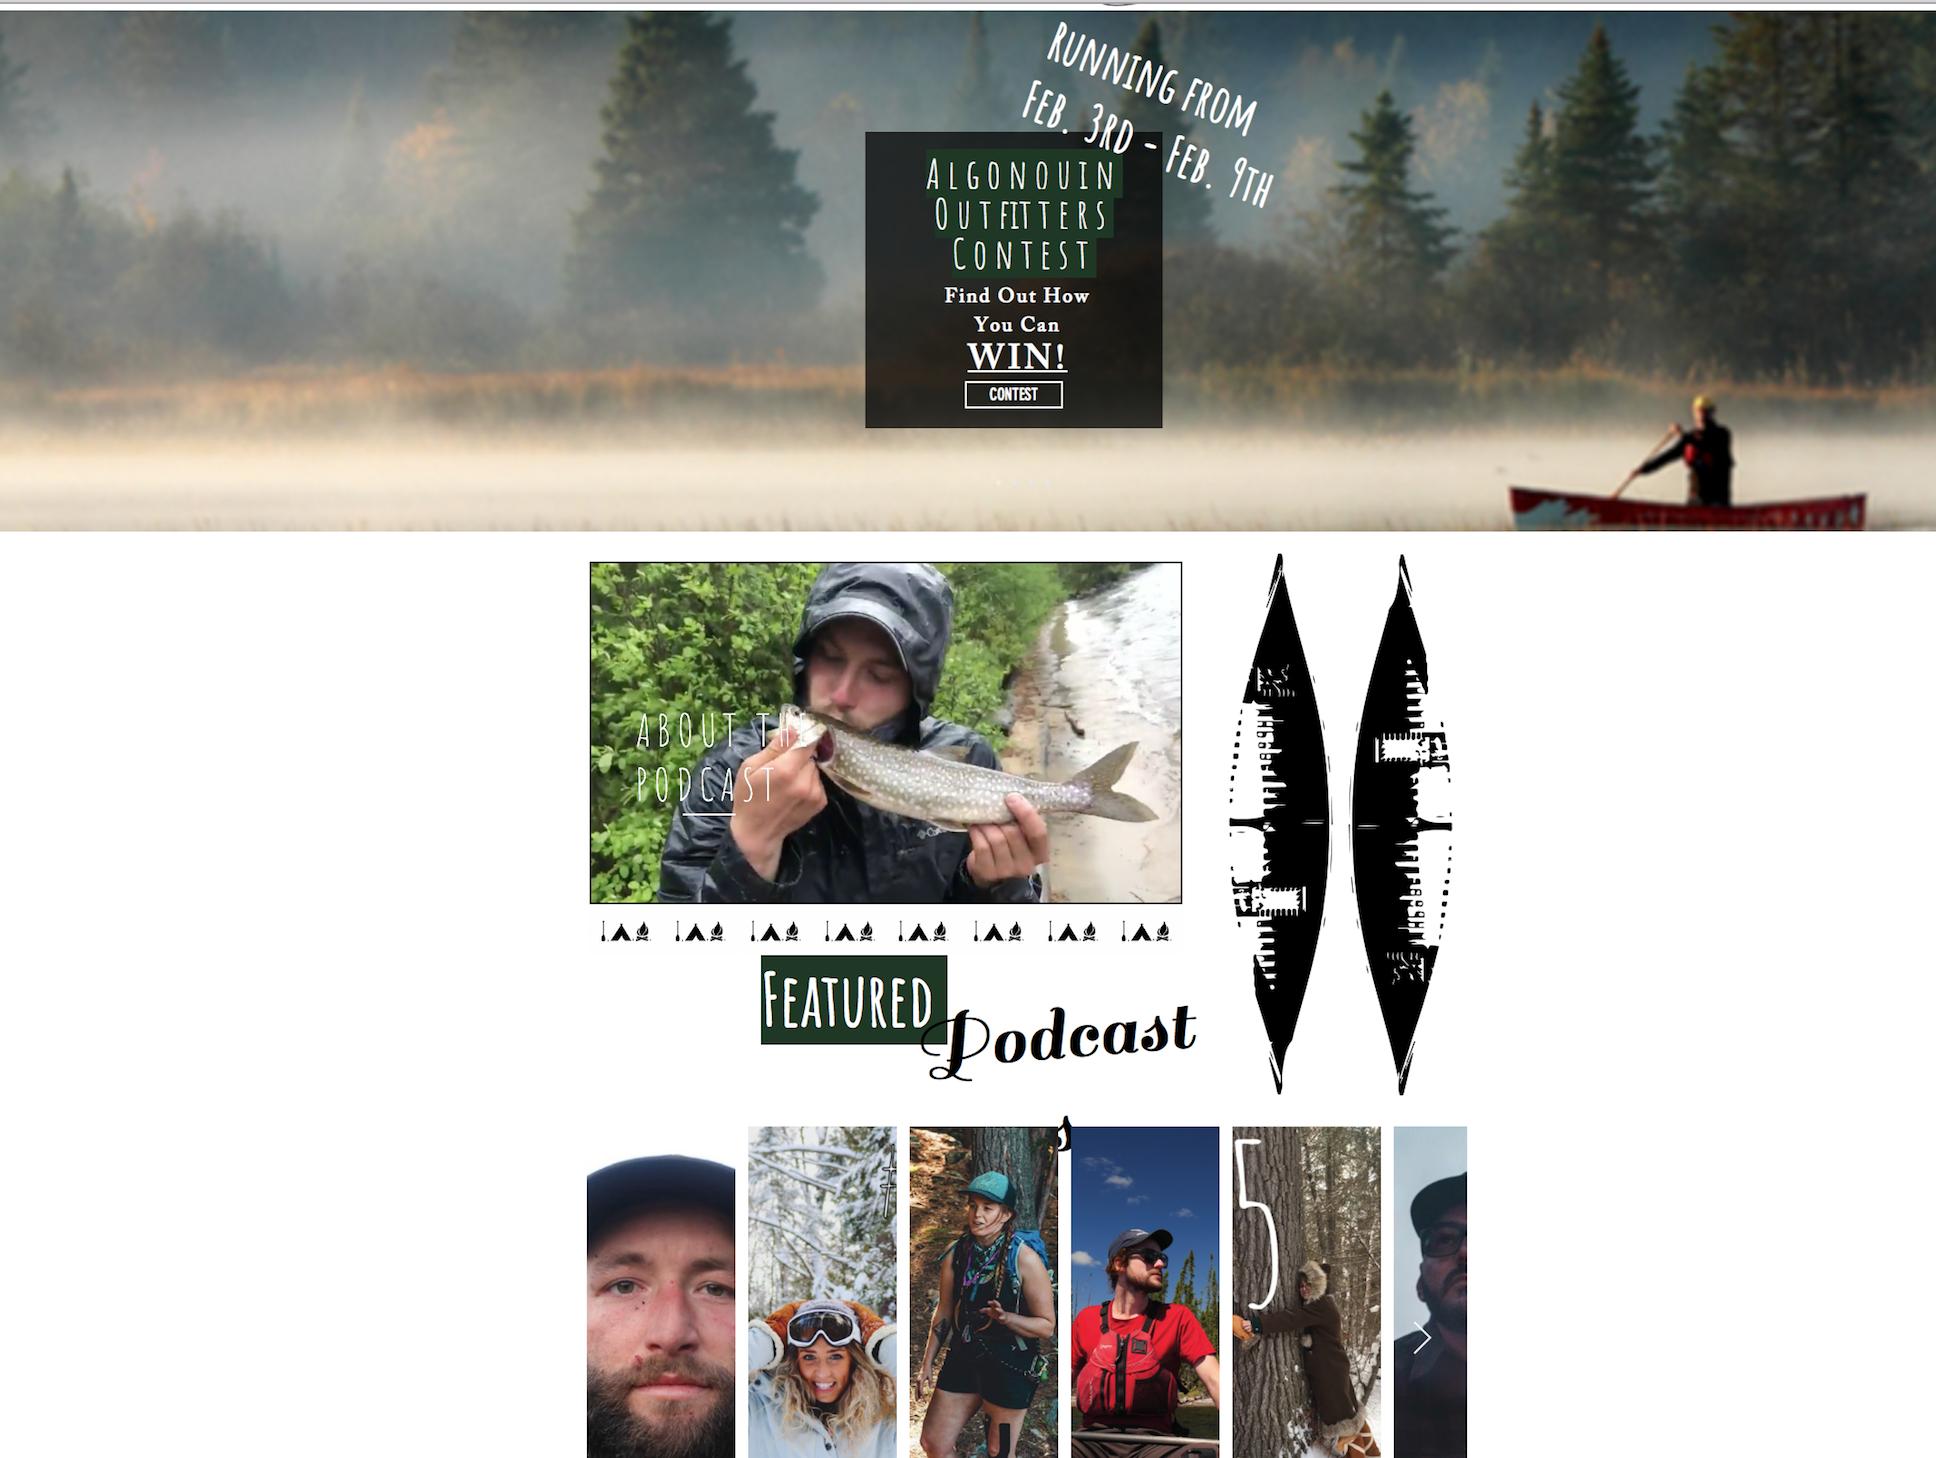 UnderTheYoke.ca website and podcast